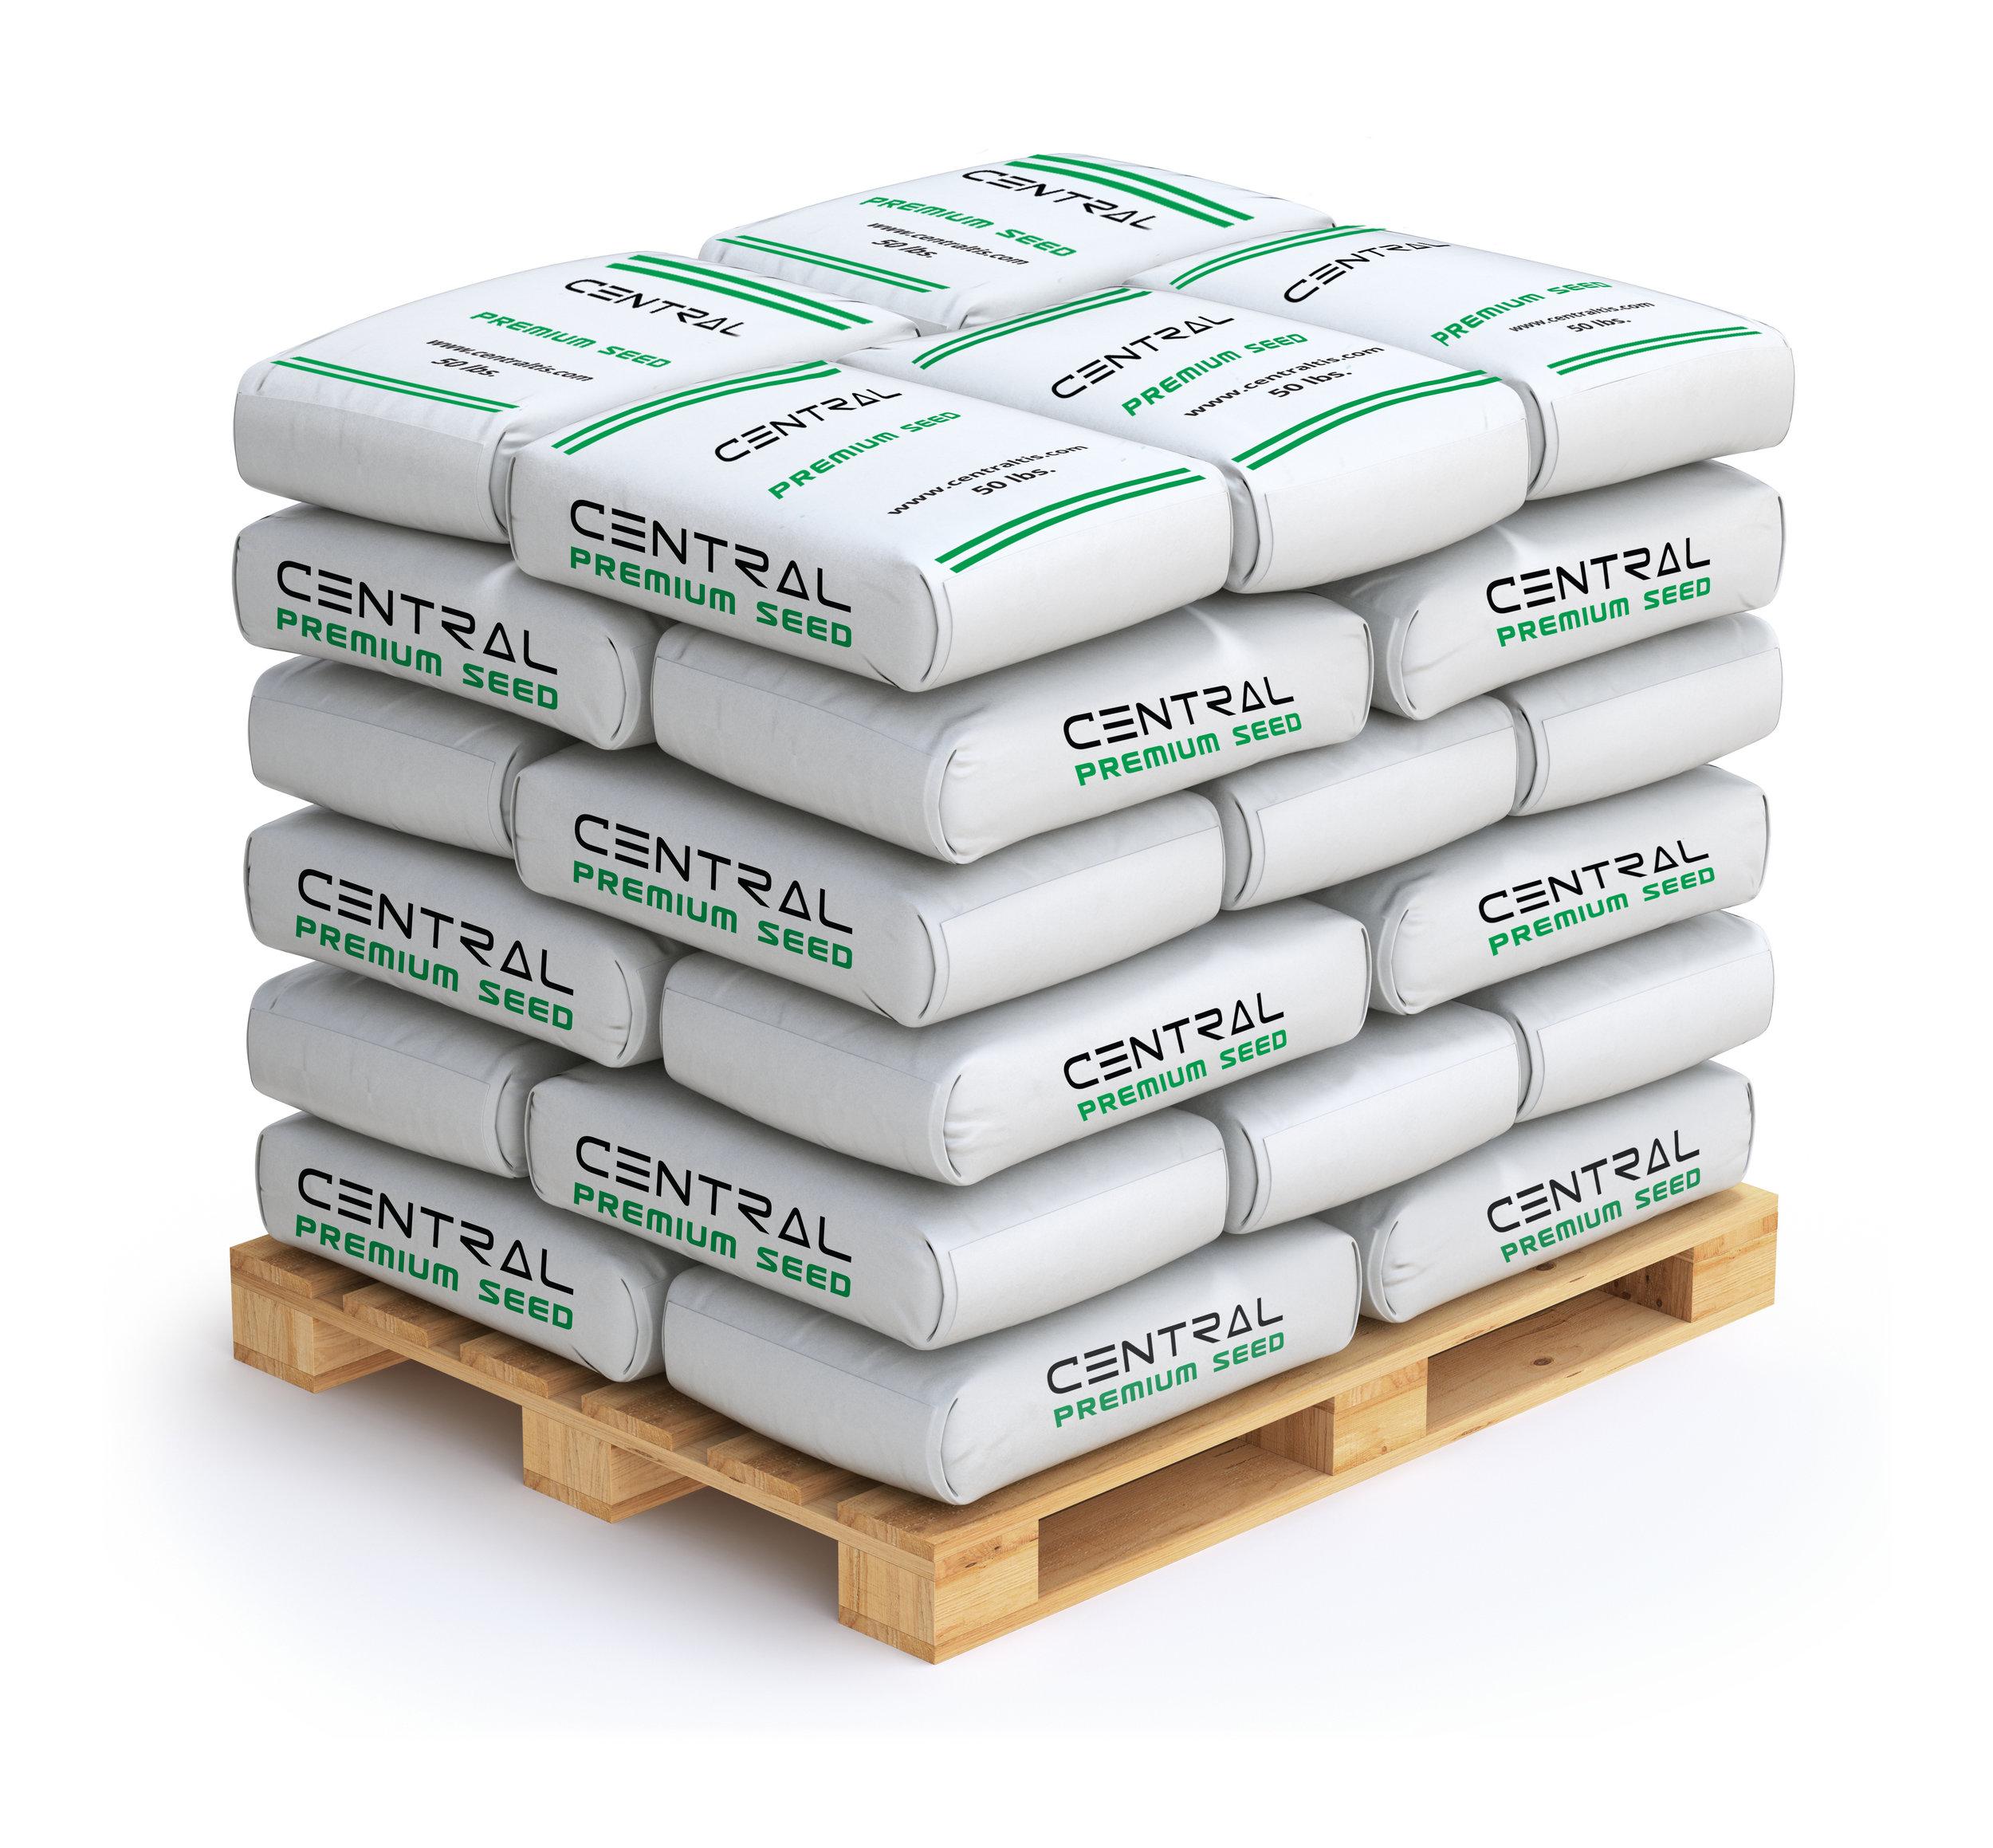 Central seed bags pallete.jpg